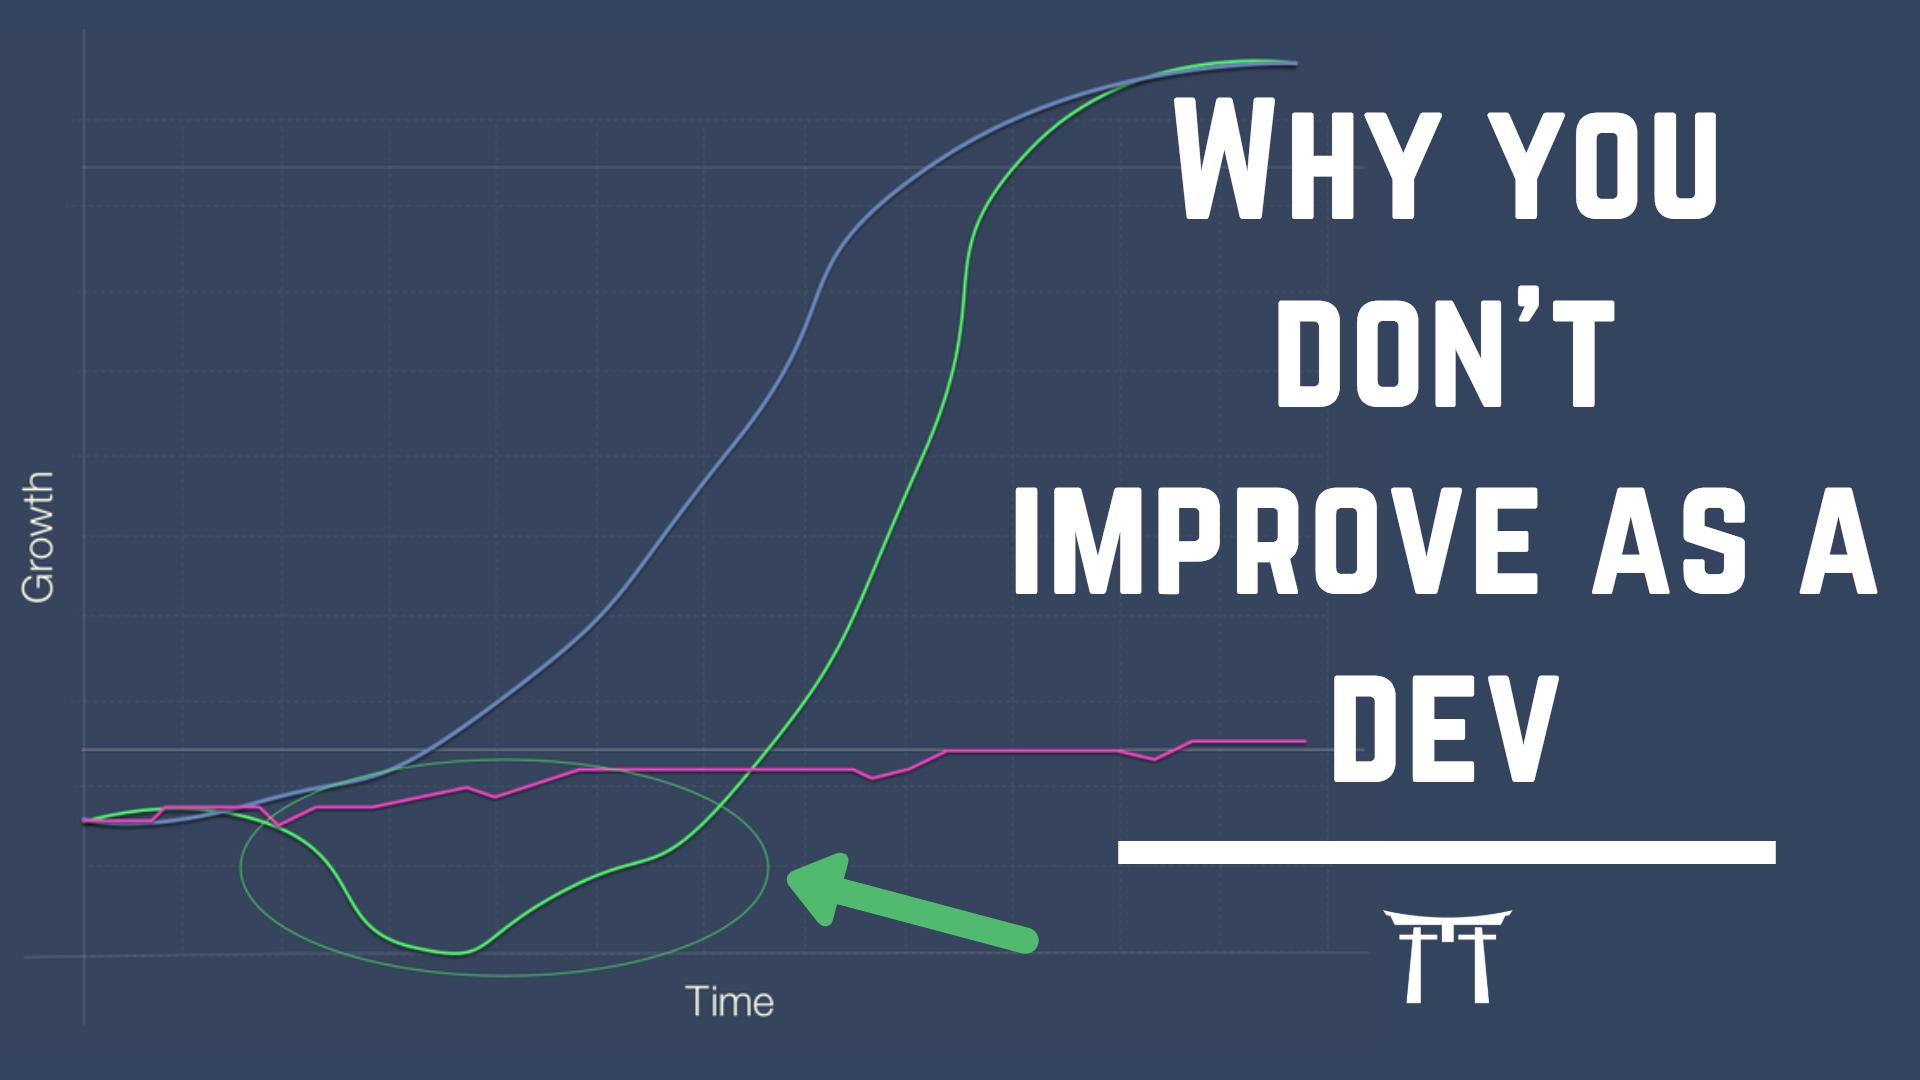 essentialdeveloper.com - Caio Zullo - #1 Reason Why You Don't Improve As a Software Developer